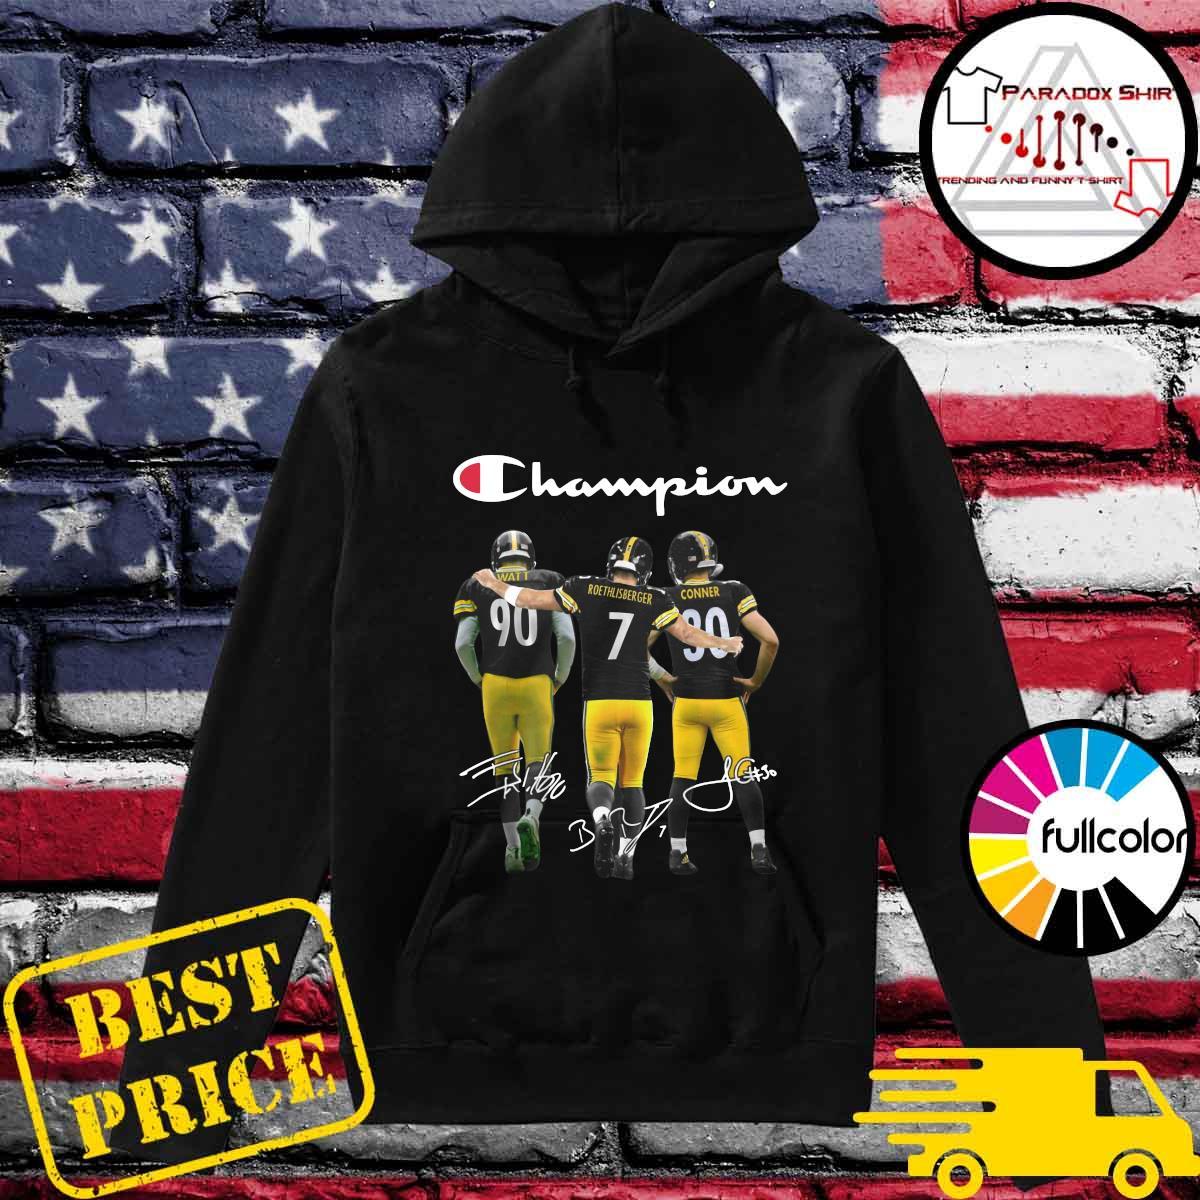 Champions Pittsburgh Steelers T J Watt 90 Ben Roethlisberger 7 James Conner 30 Signatures Shirt Hoodie